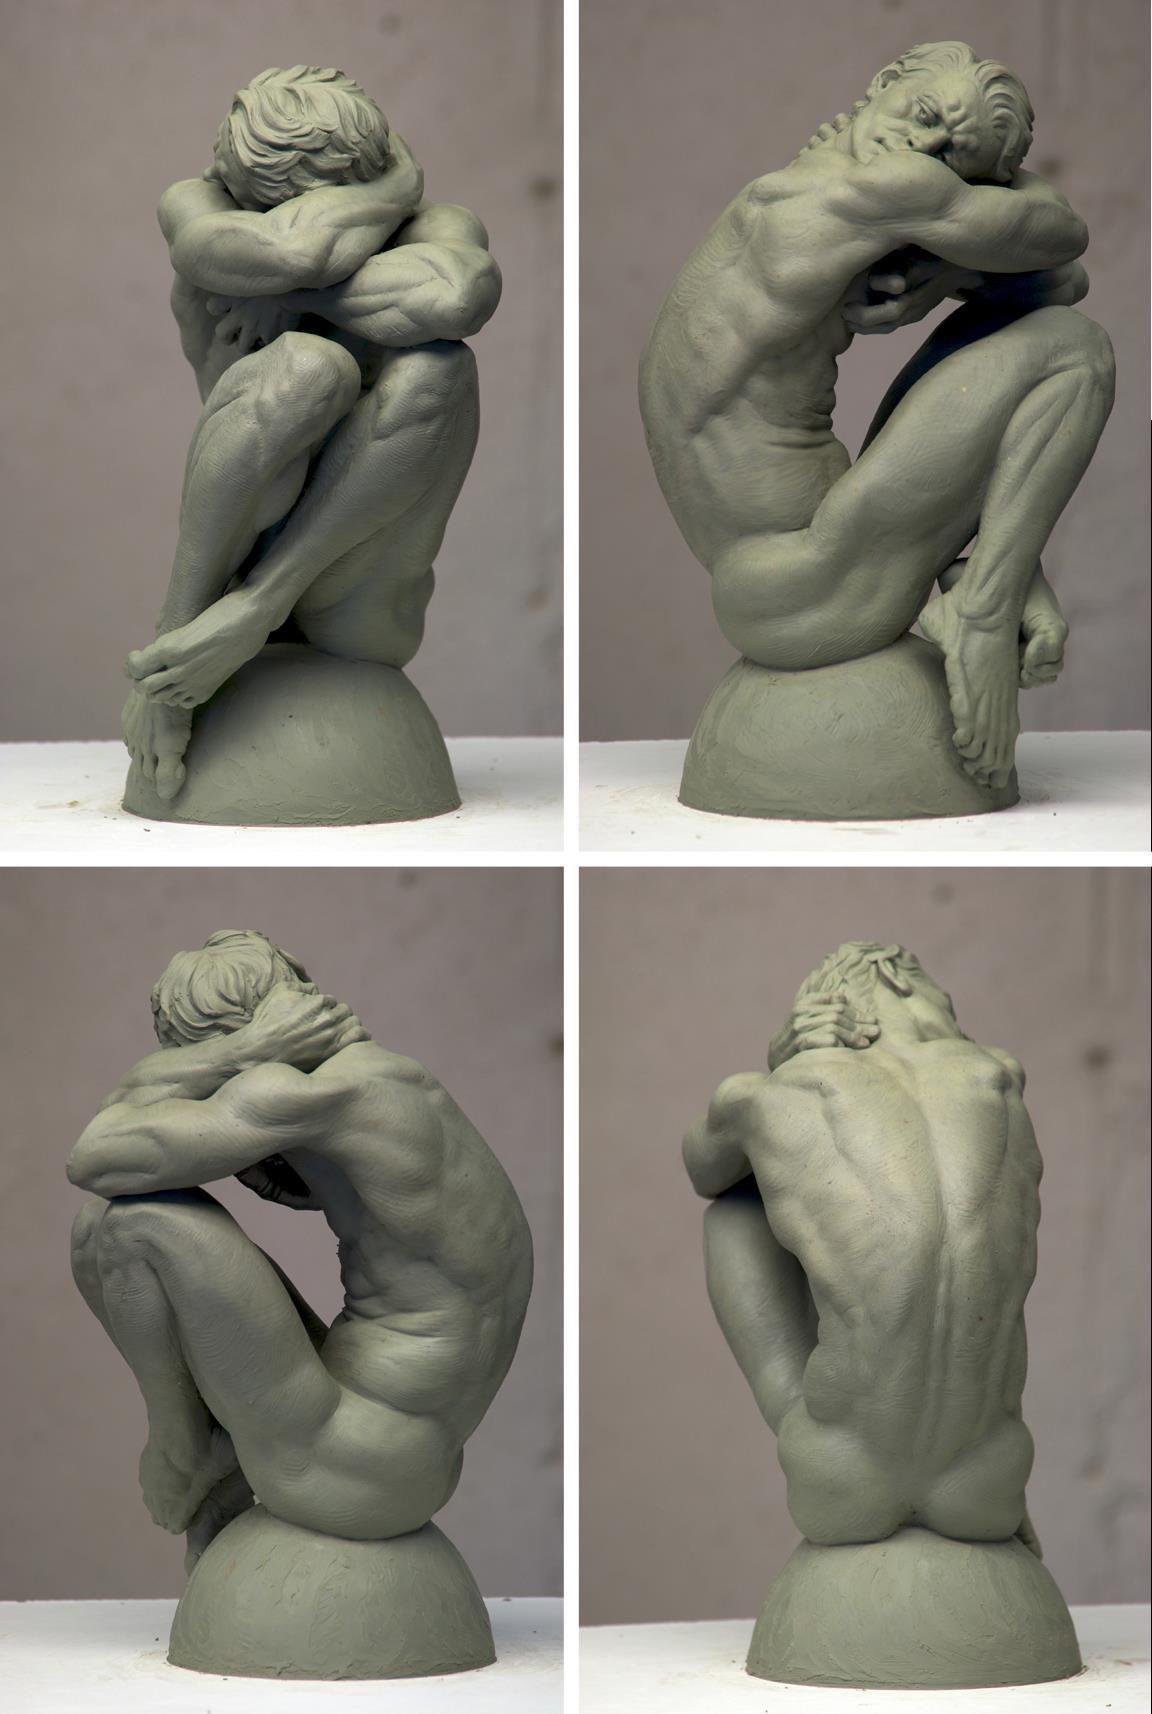 clay master | RefsRefsRefs! | Pinterest | Escultura, Anatomía y ...